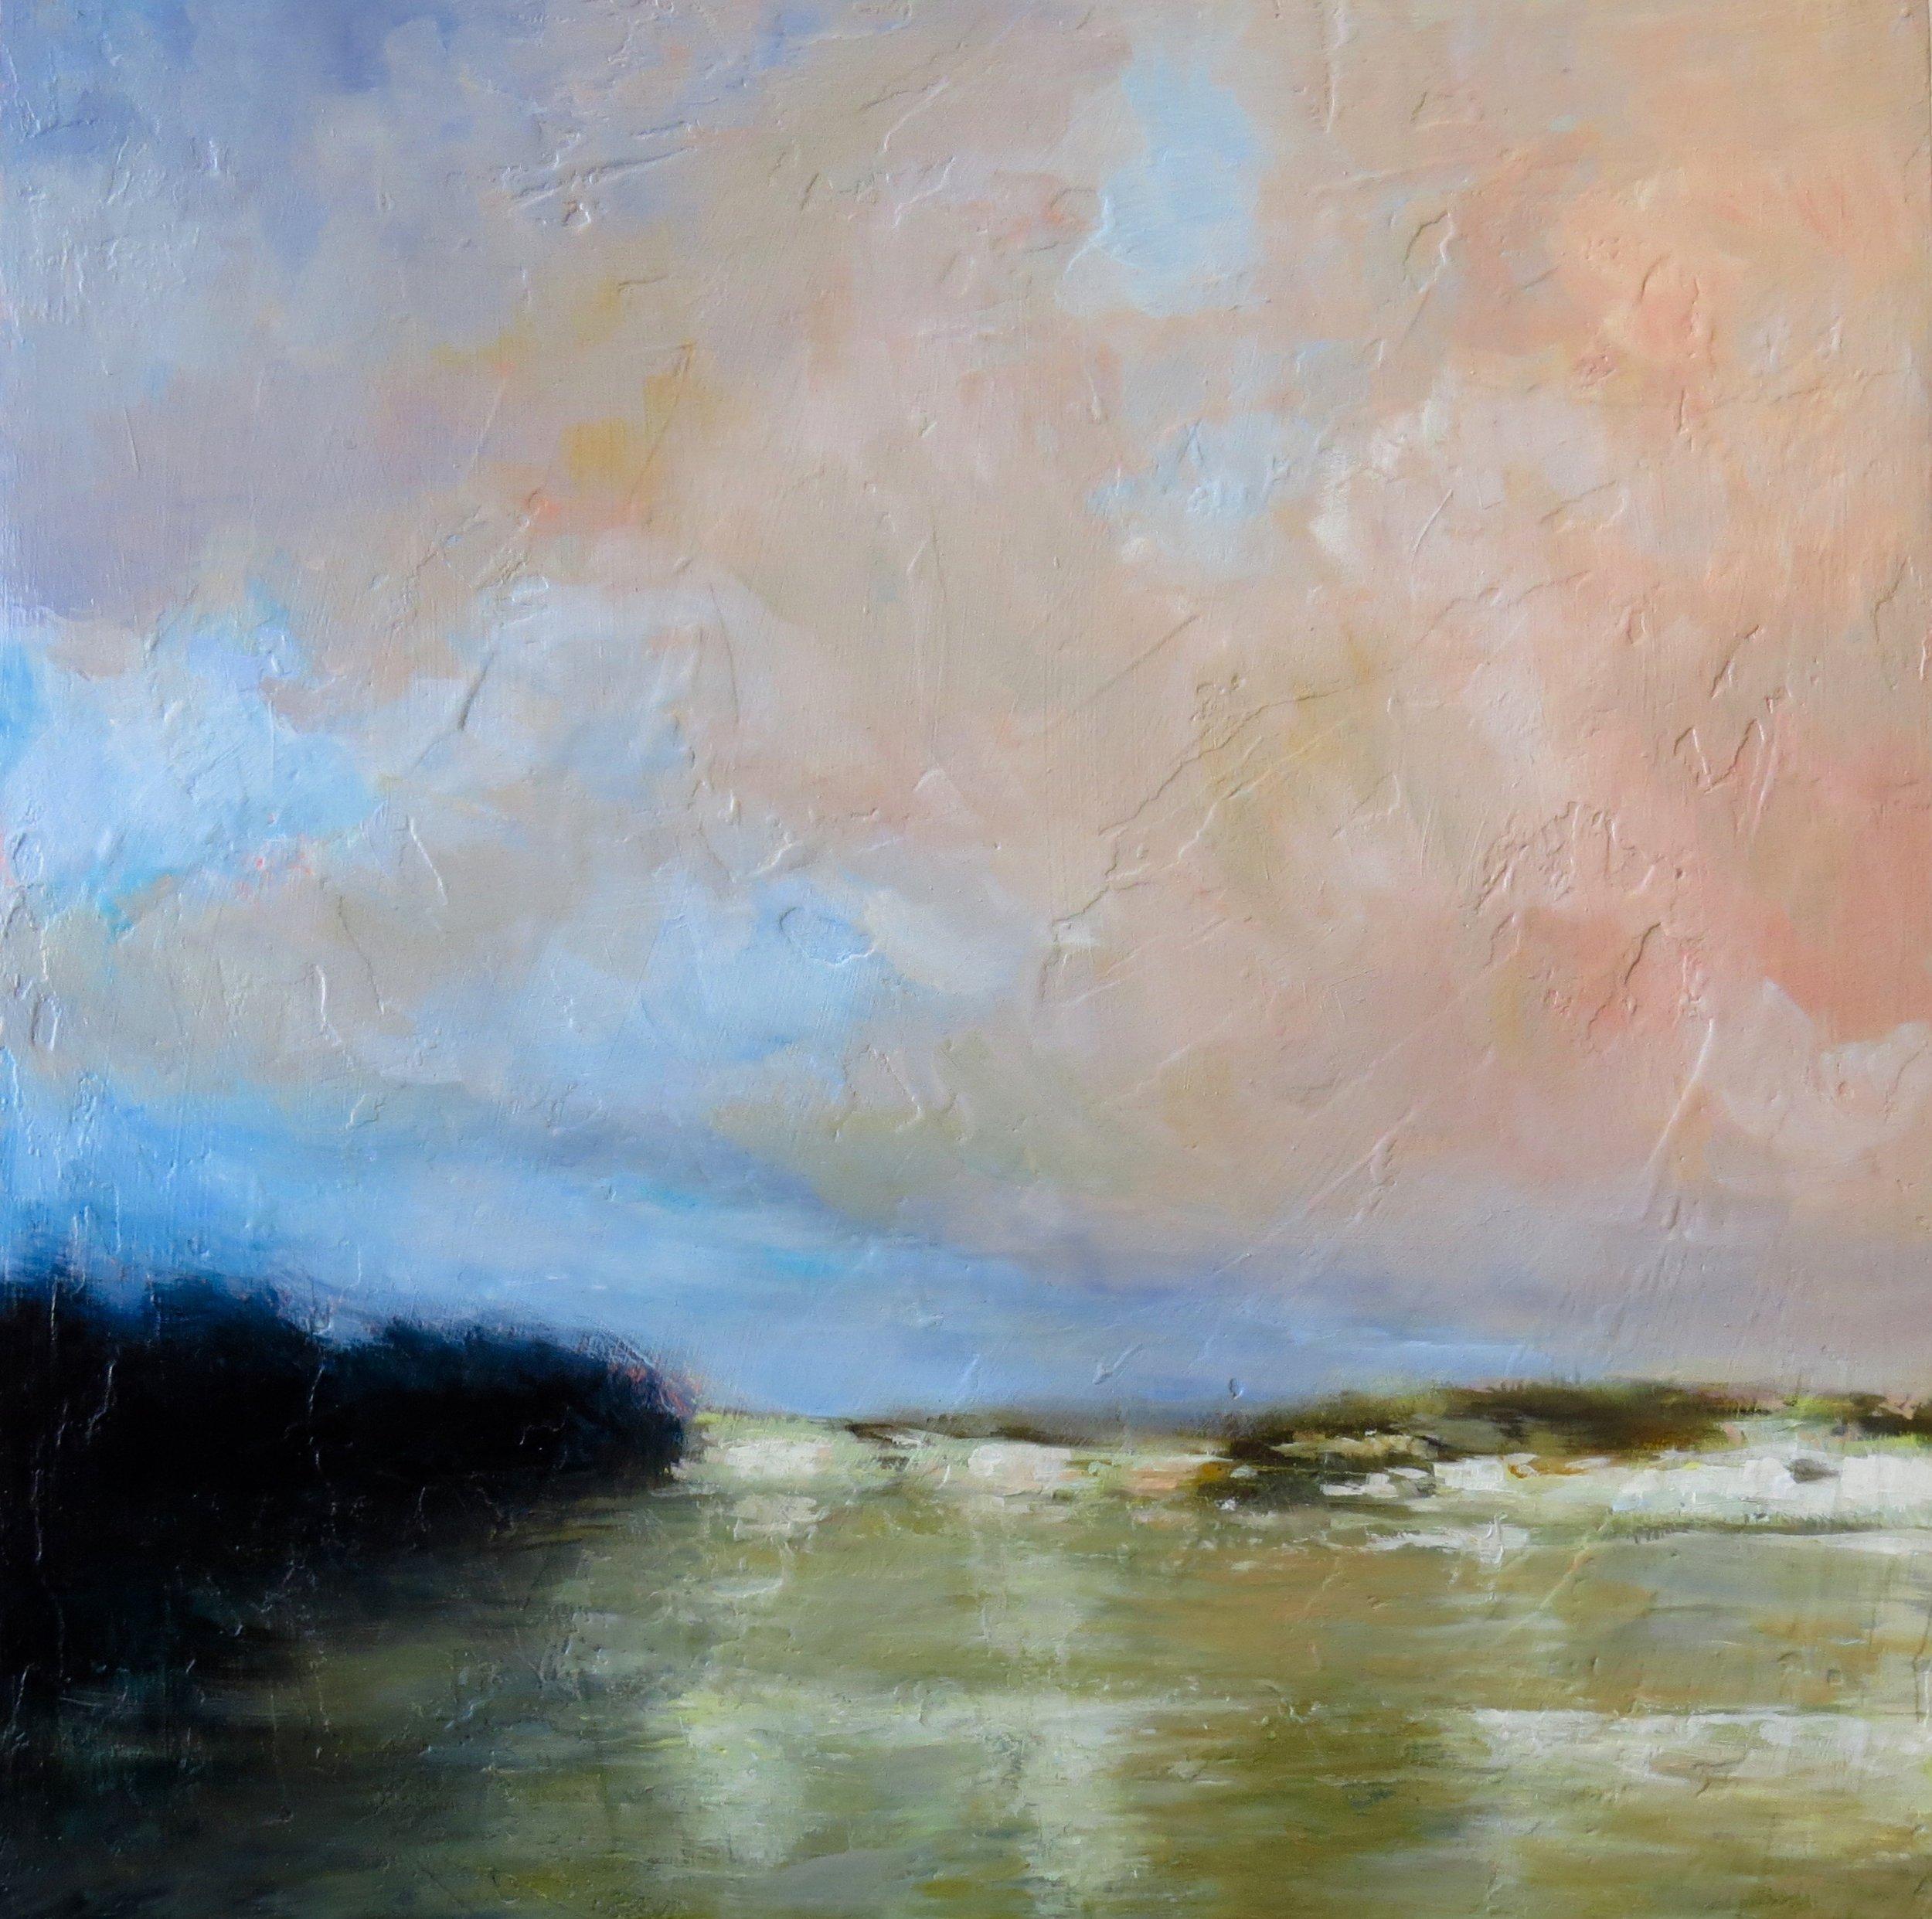 GiselleGautreau.Potomac.painting.2017.jpg